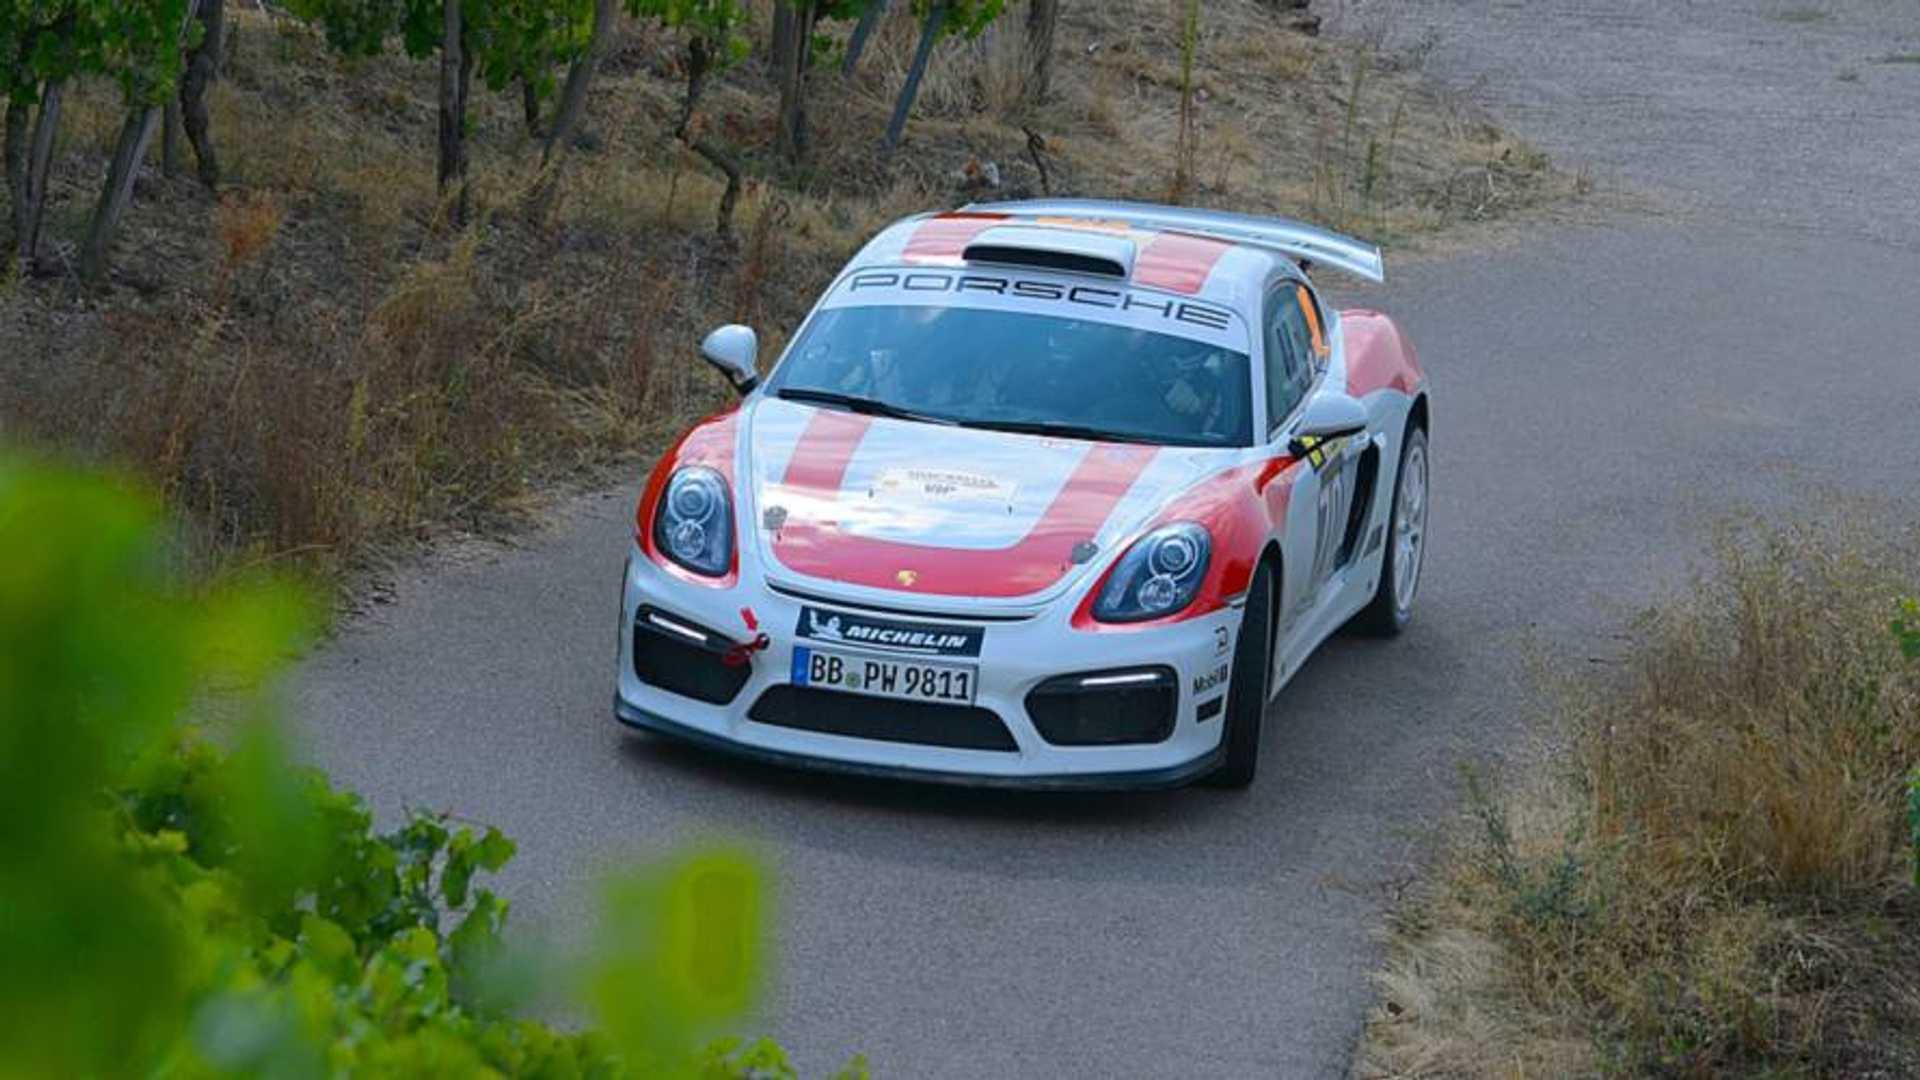 Porsche Wants 100 Buyers To Make Cayman Rally Car Happen